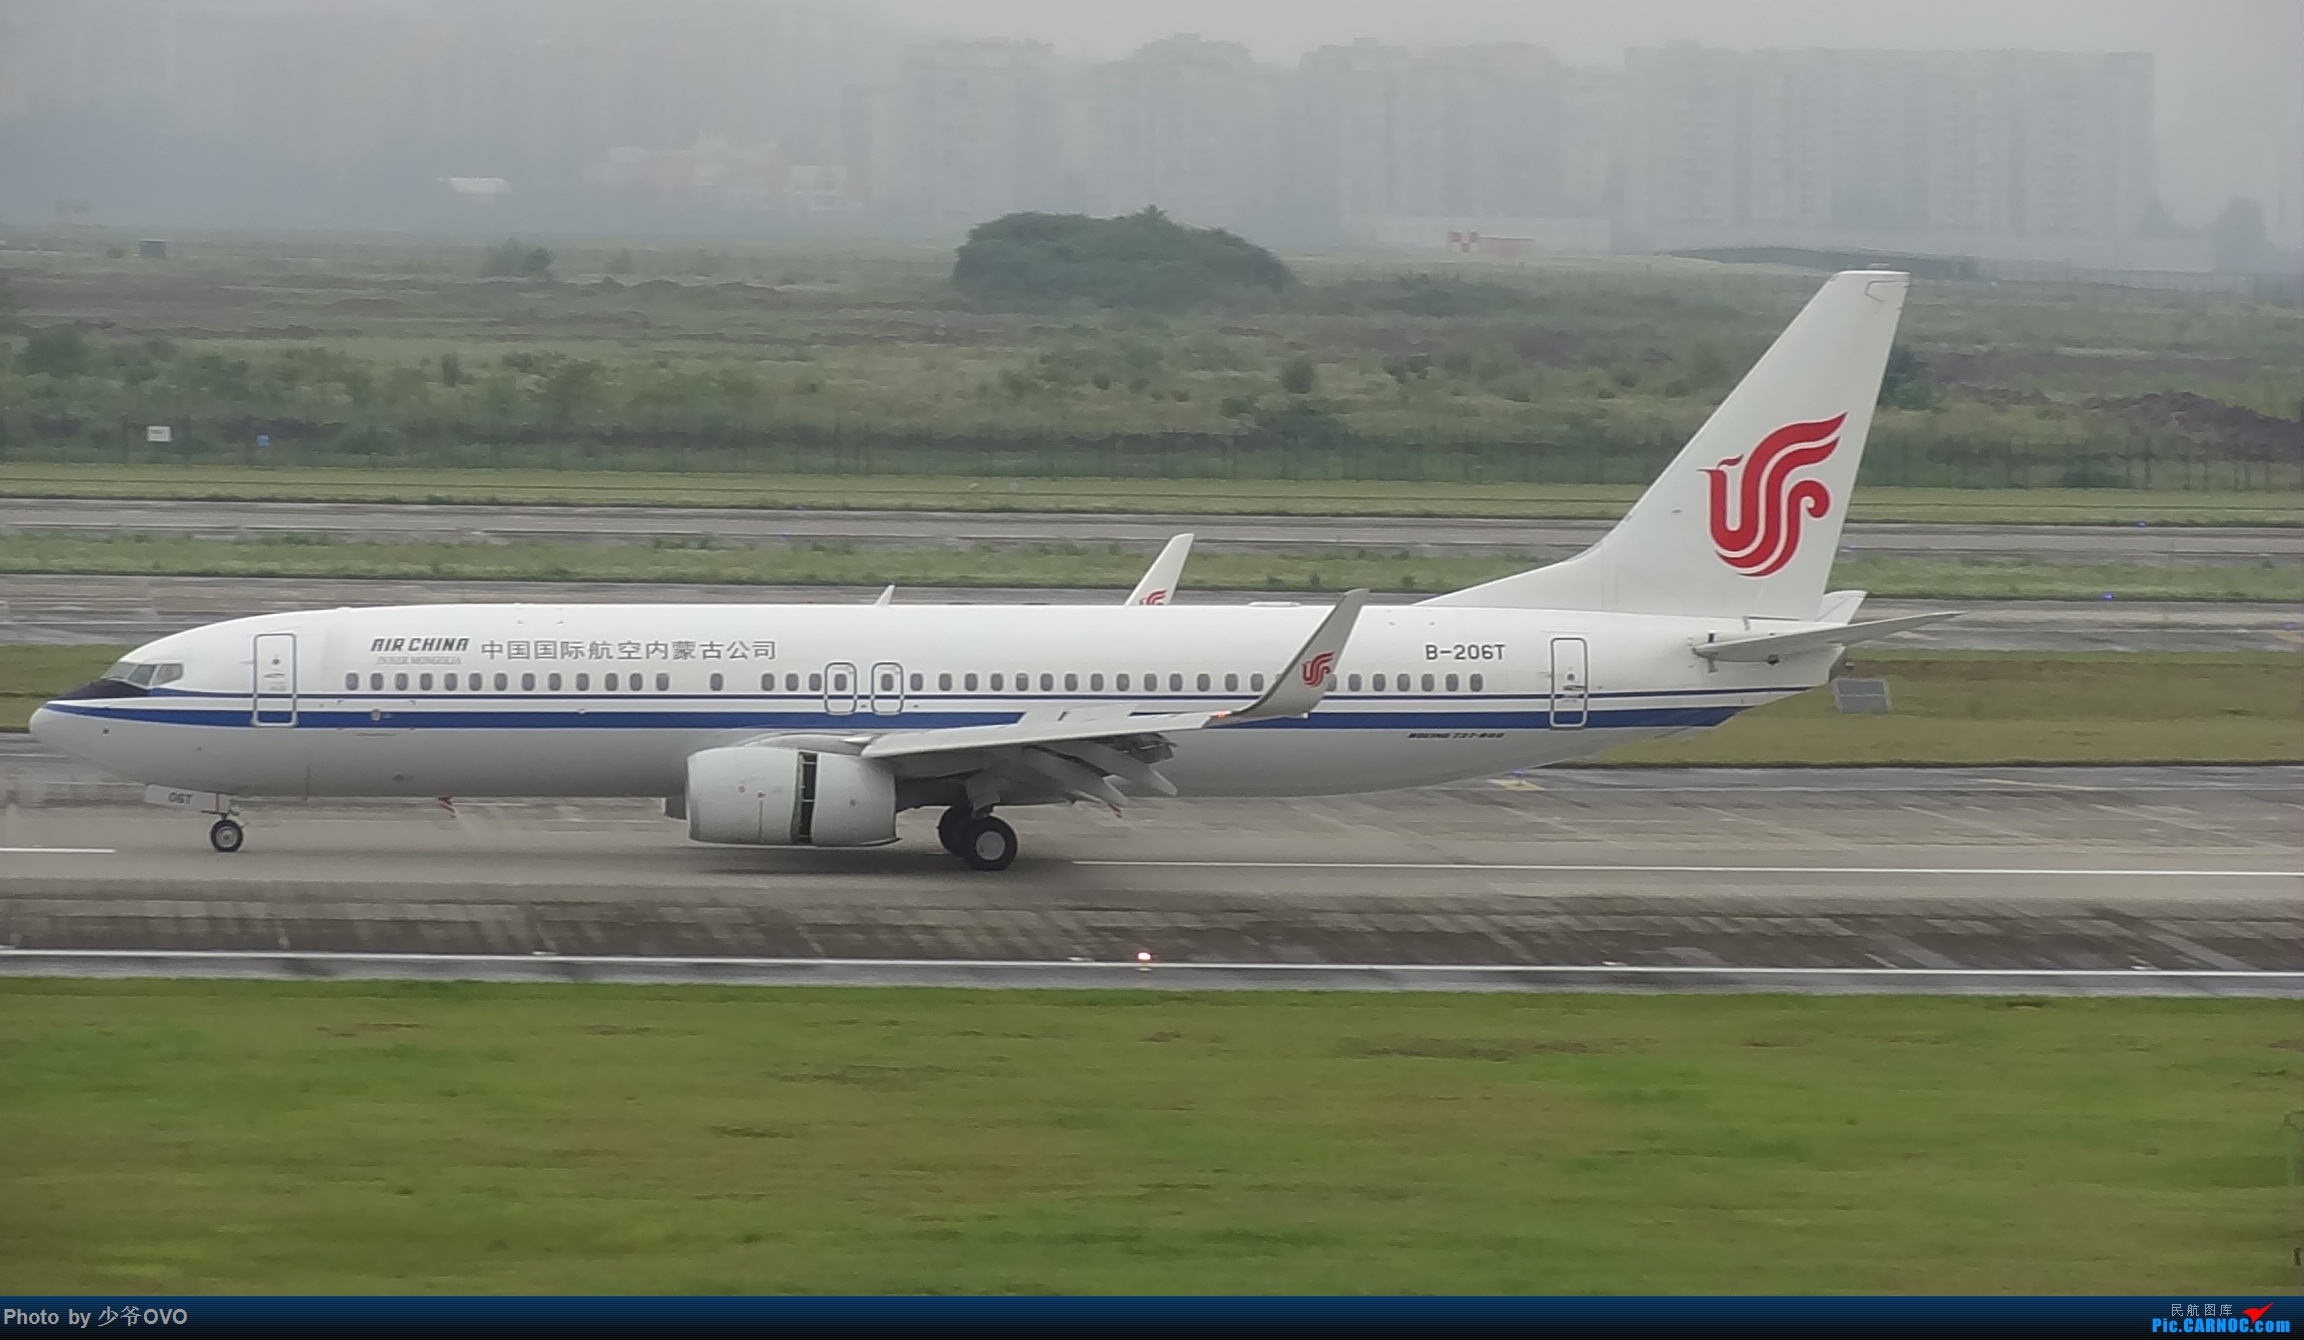 Re:[原创]CKG重庆江北机场拍机 ,中法建交50周年 BOEING 737-800 B-206T 中国重庆江北国际机场